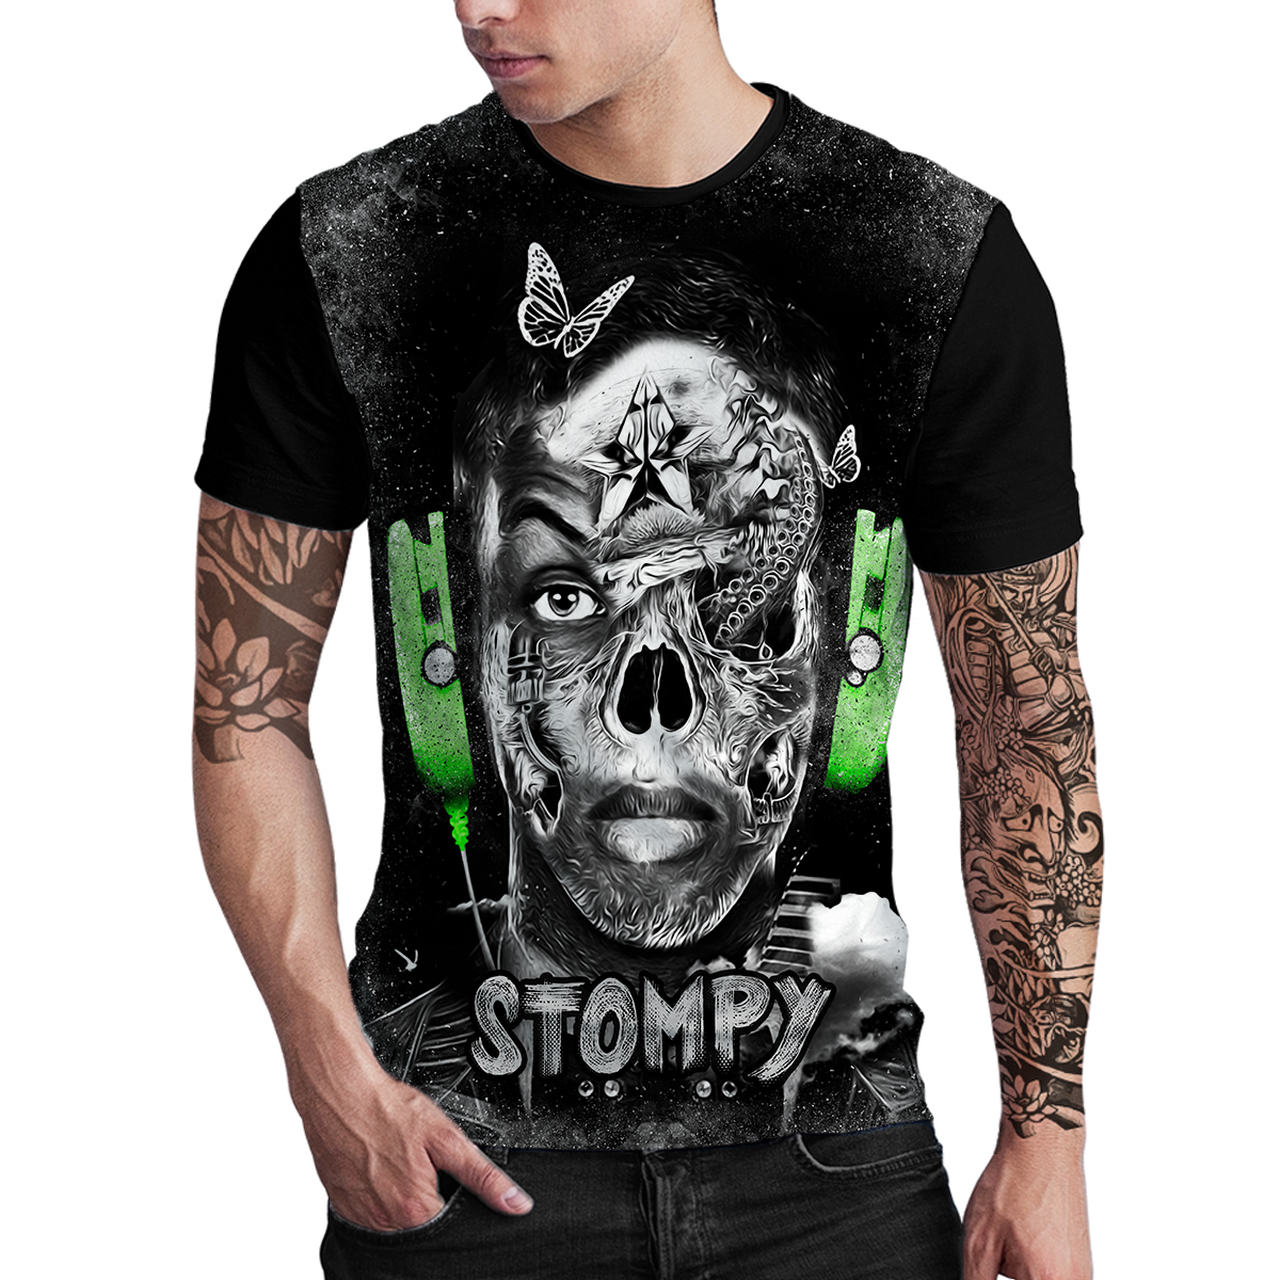 Stompy Camiseta Estampada Masculina Modelo 135